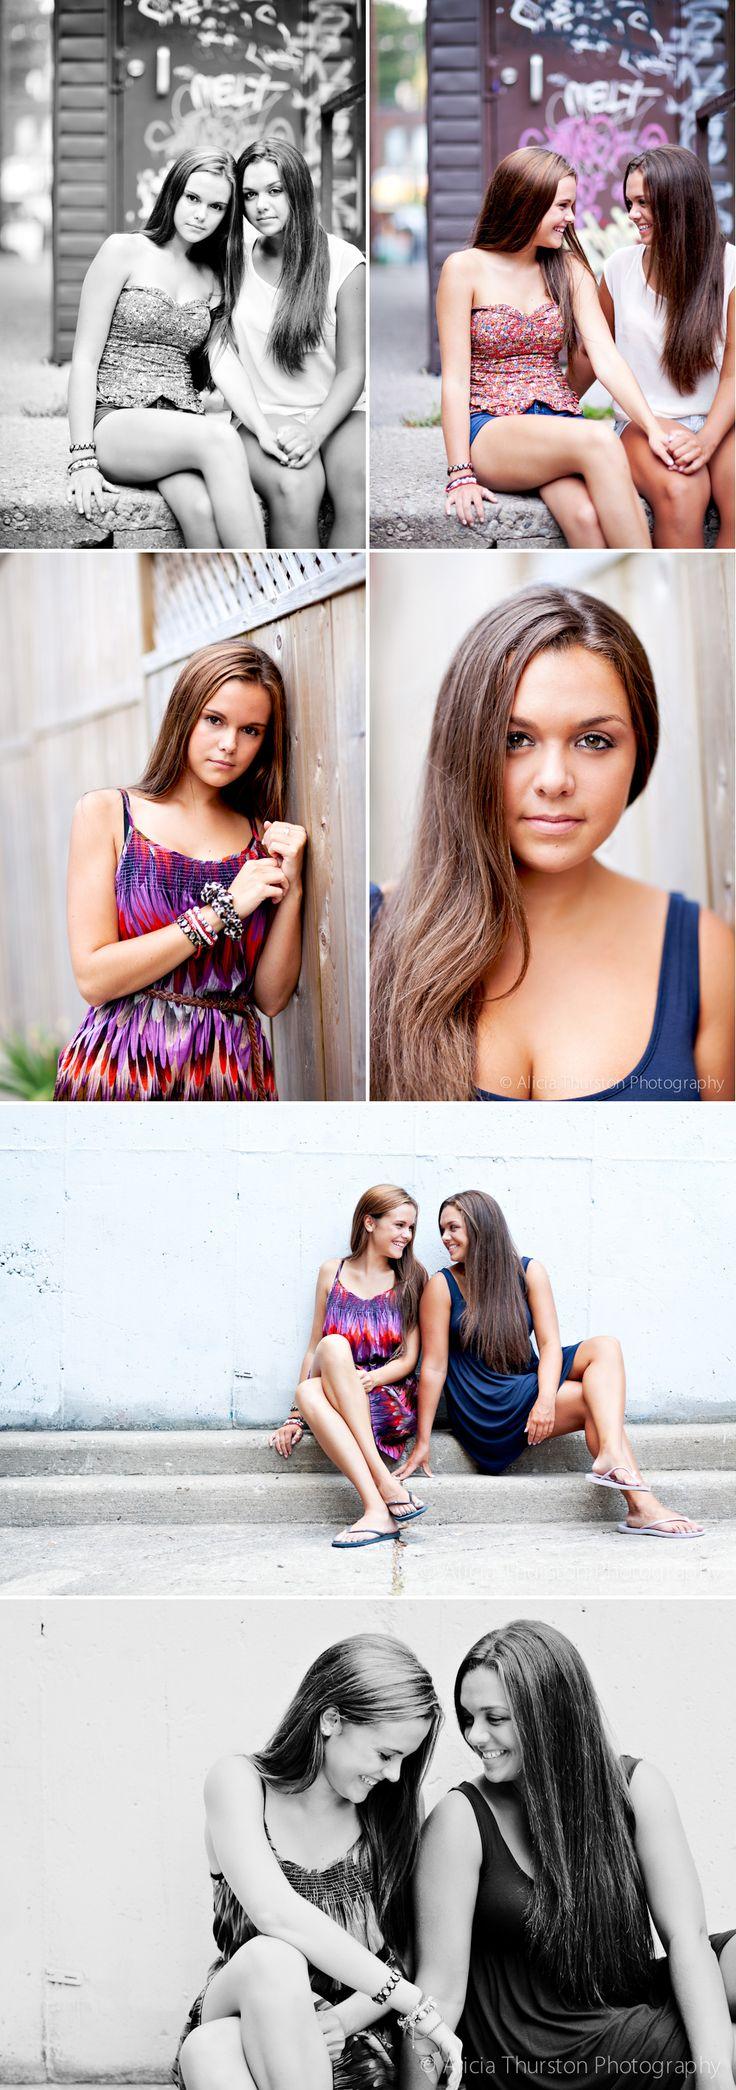 My sister, my strength – Toronto Teen Photographer » Alicia Thurston Photography